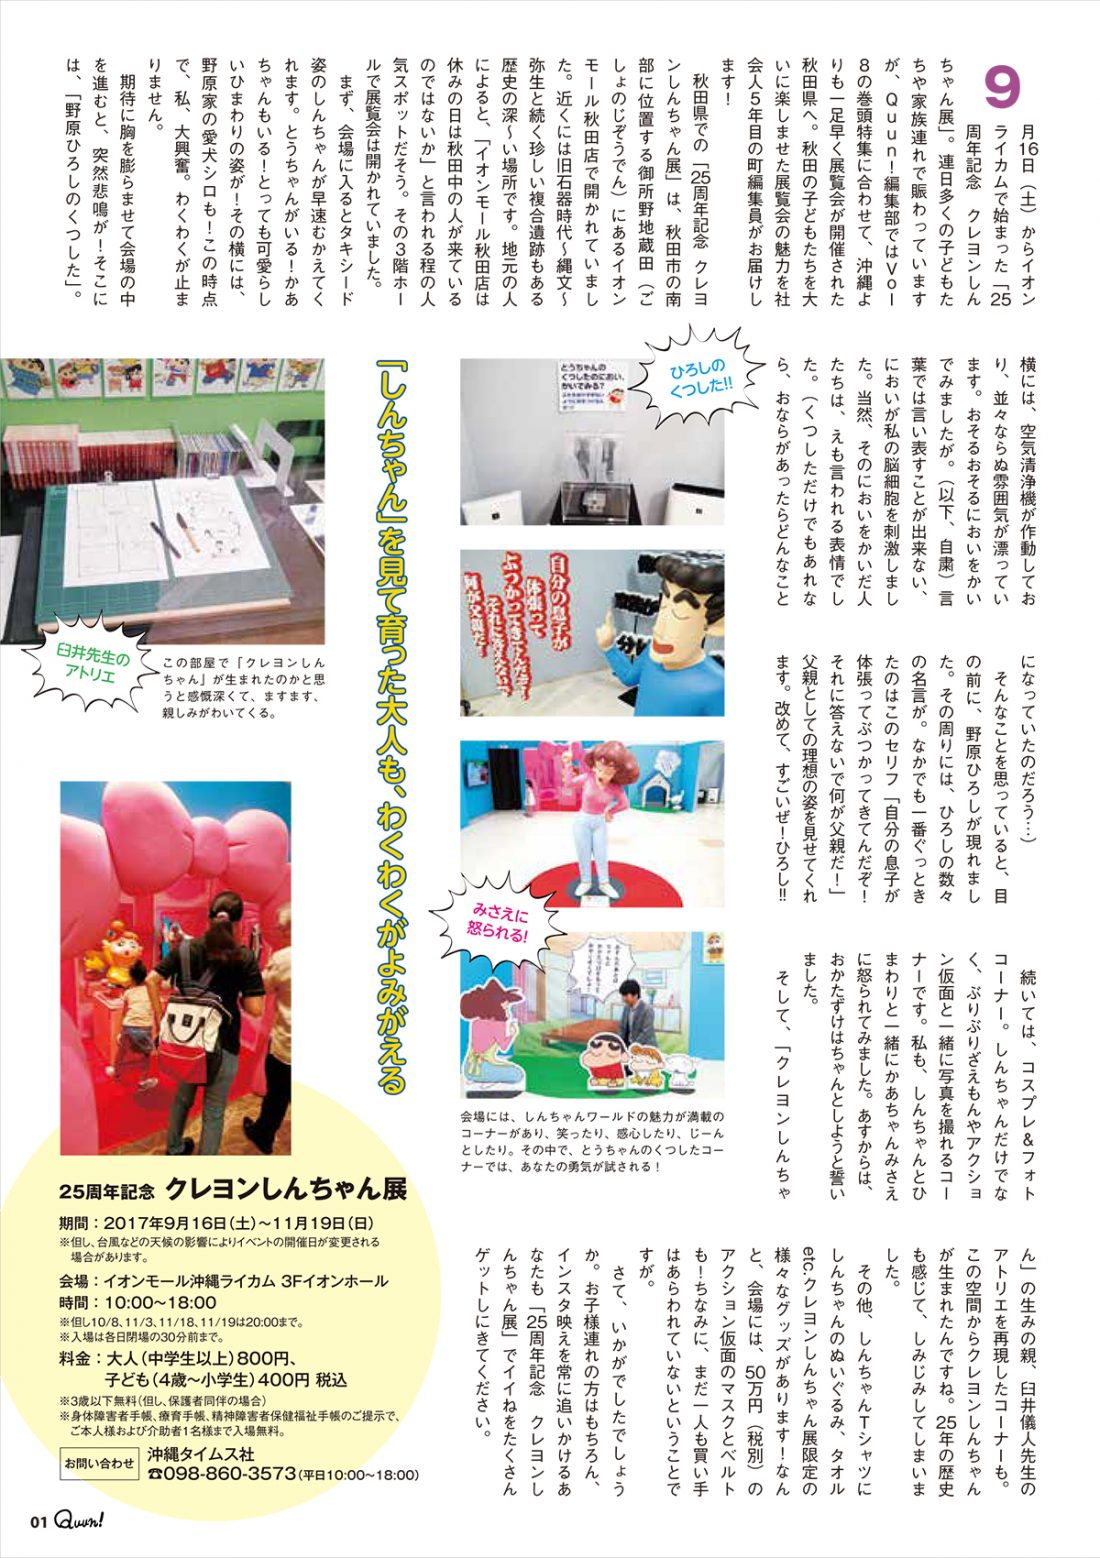 https://www.qab.co.jp/qgoro/wp-content/uploads/quun_0803-1100x1558.jpg